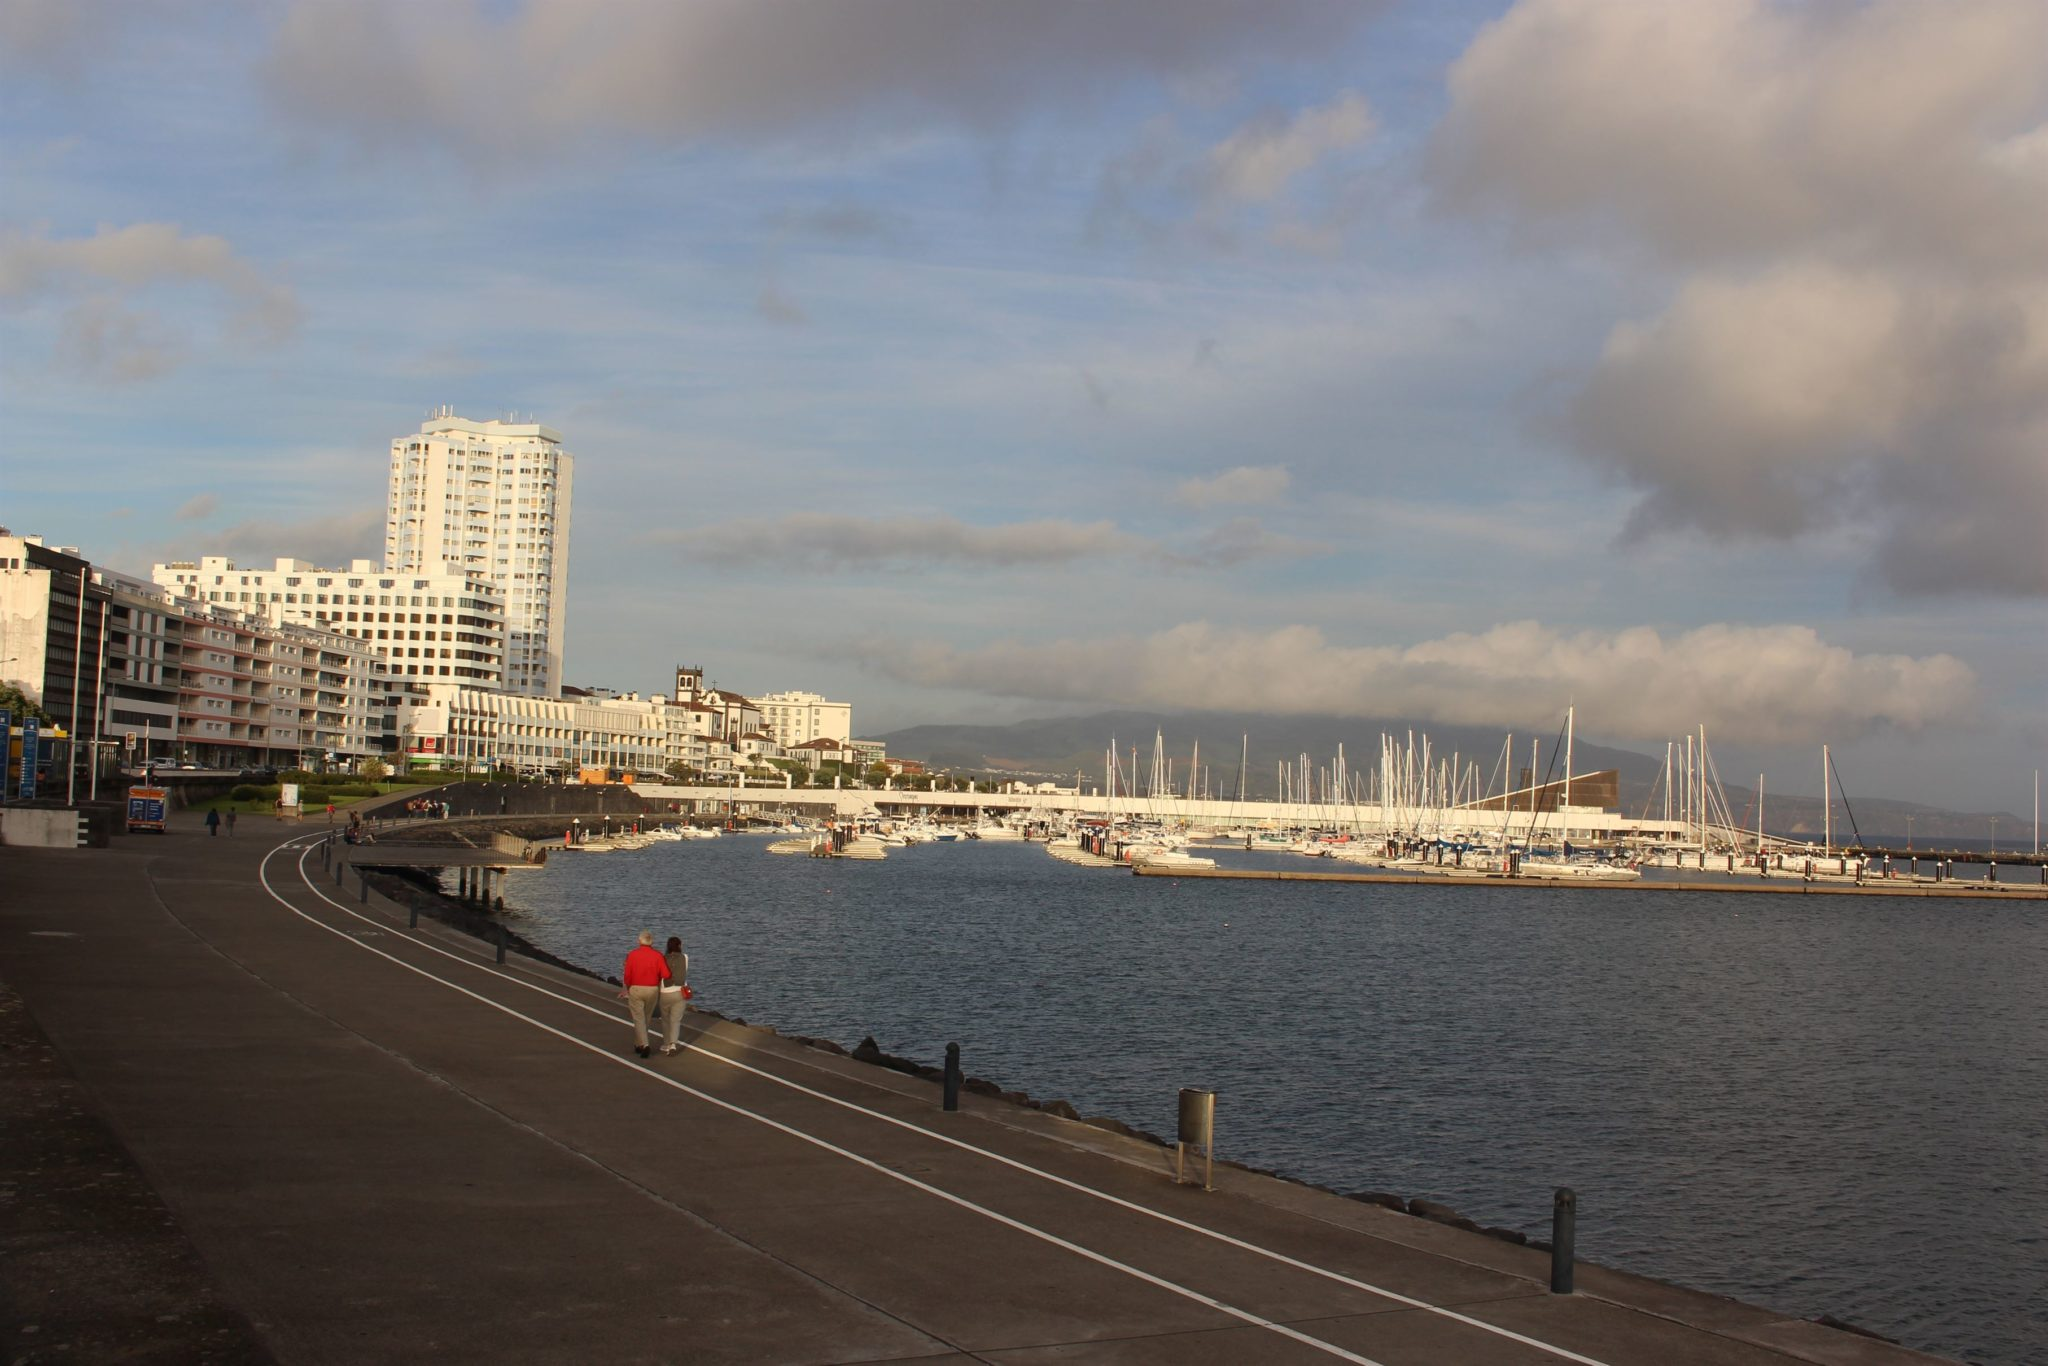 Passeio marítimo, S. Miguel, Açores